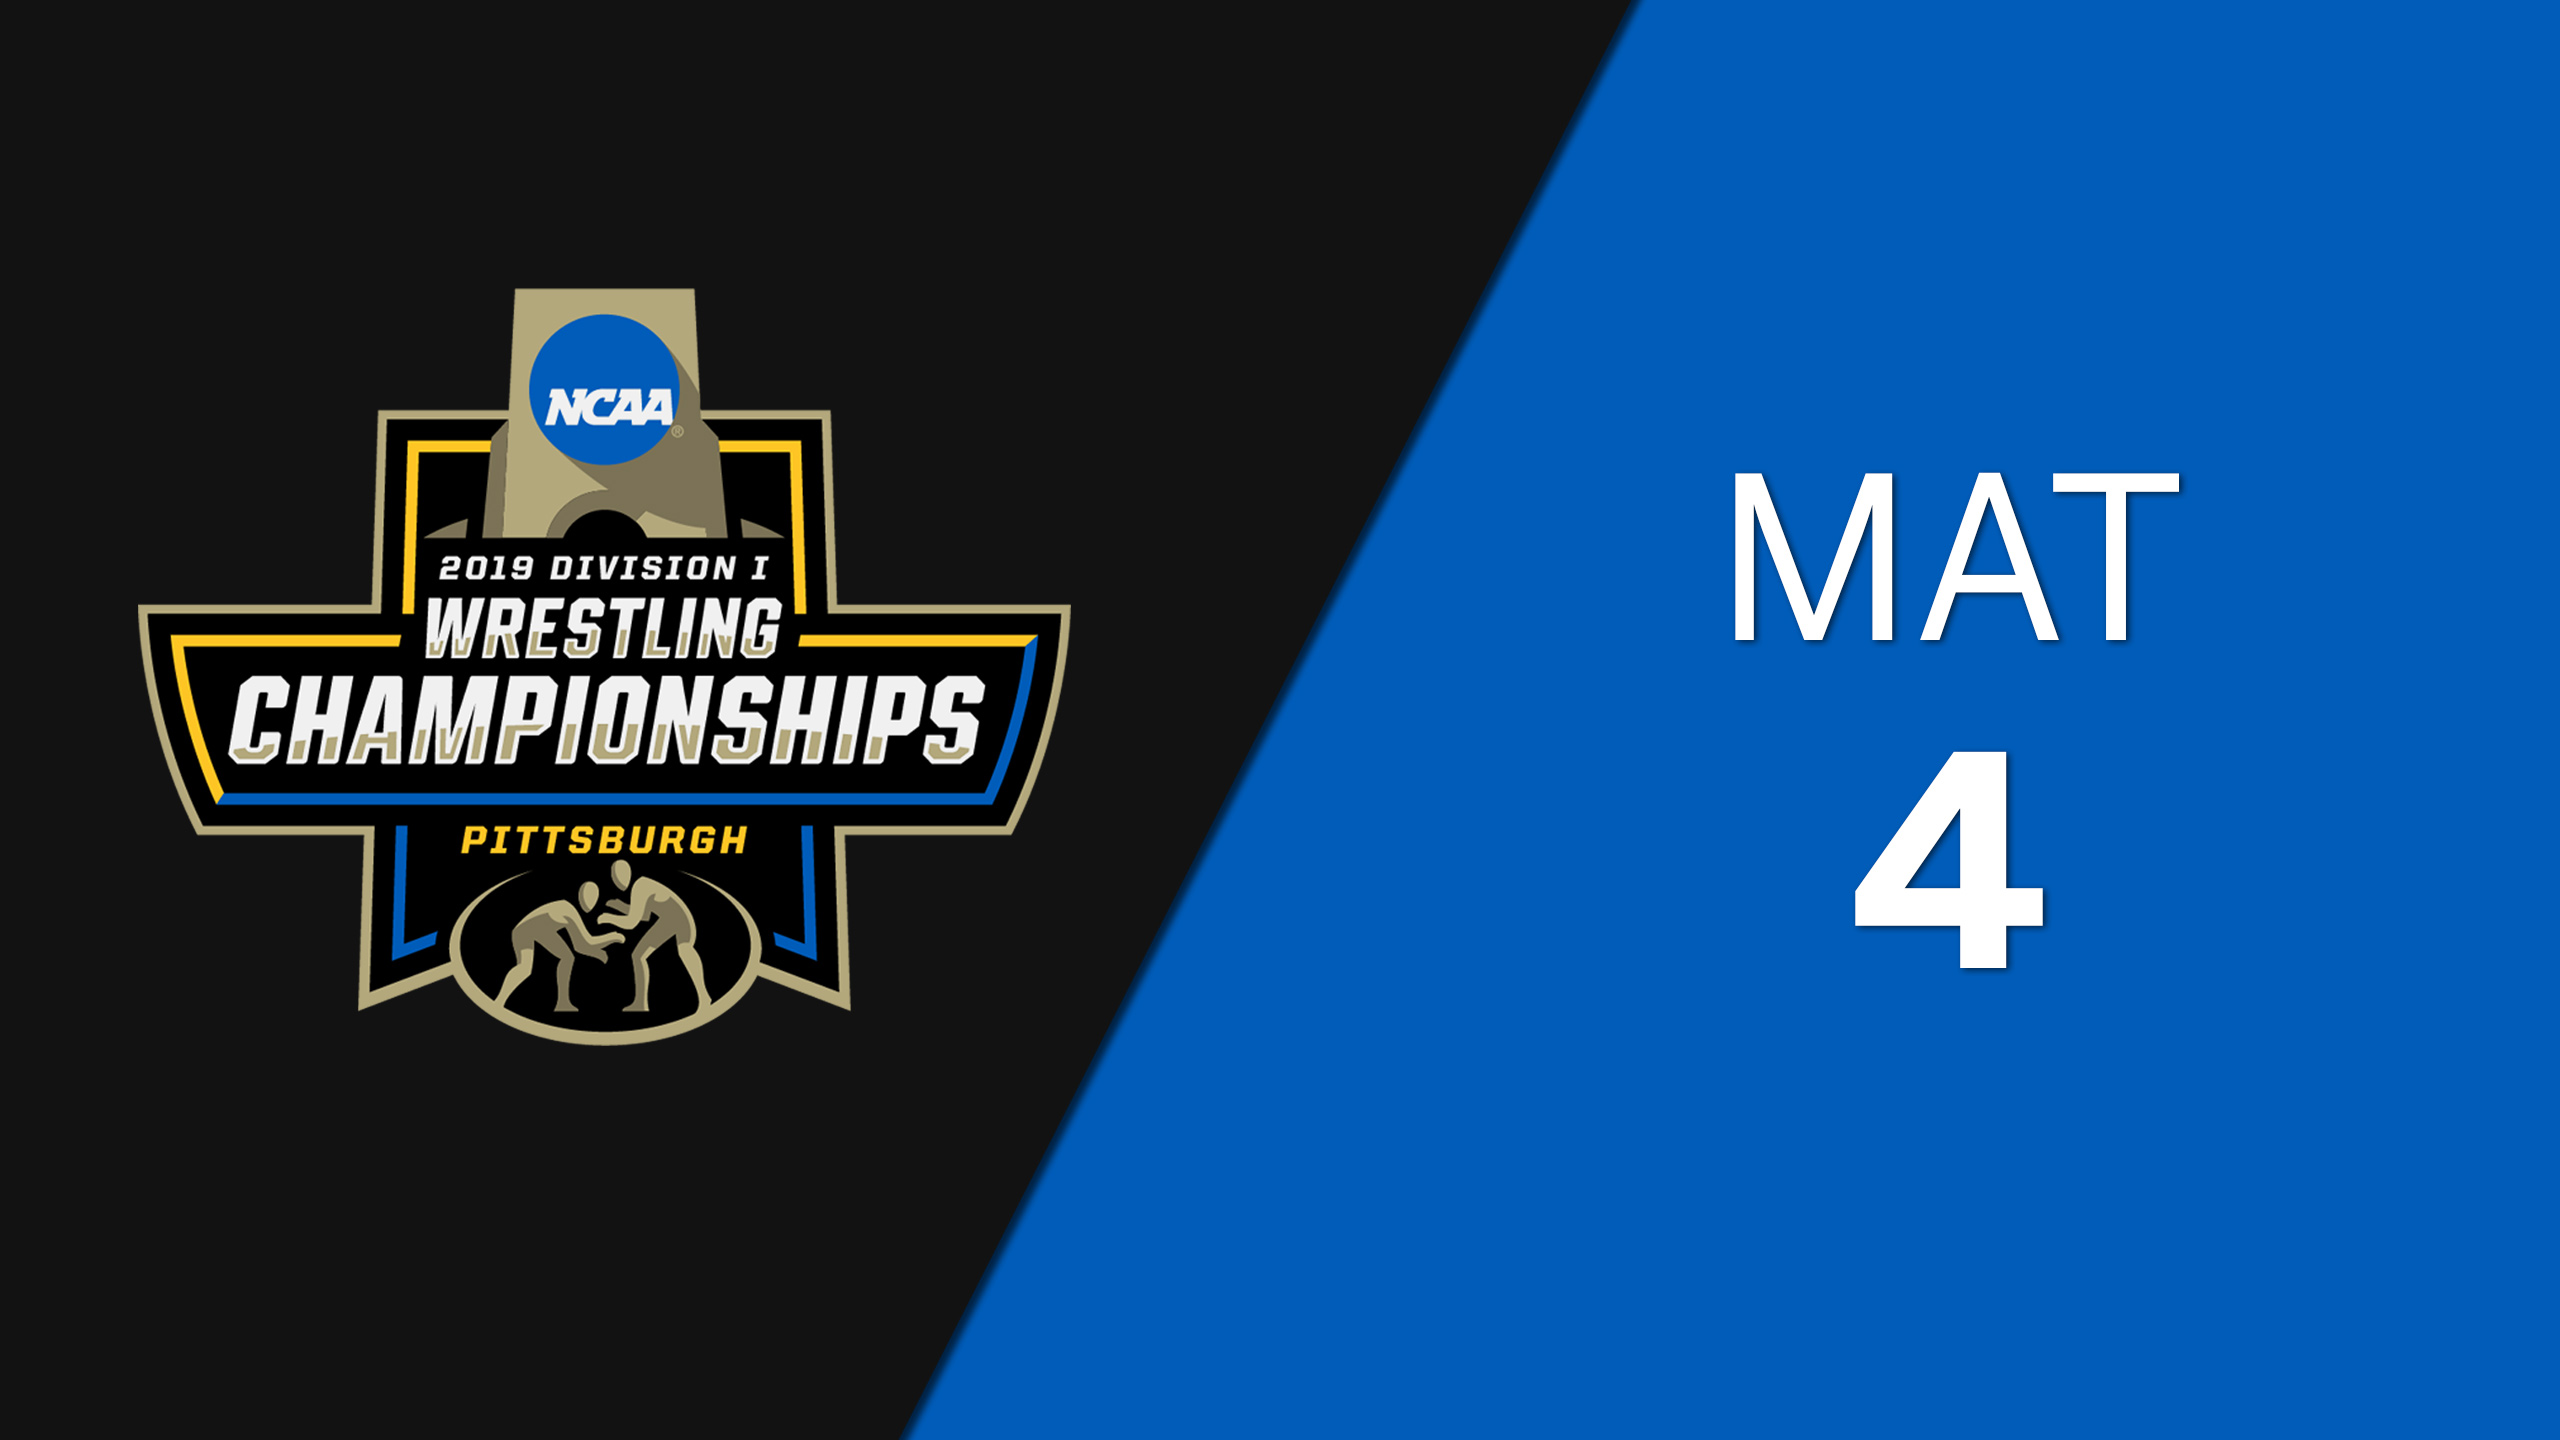 NCAA Wrestling Championship (Mat 4, Second Round)